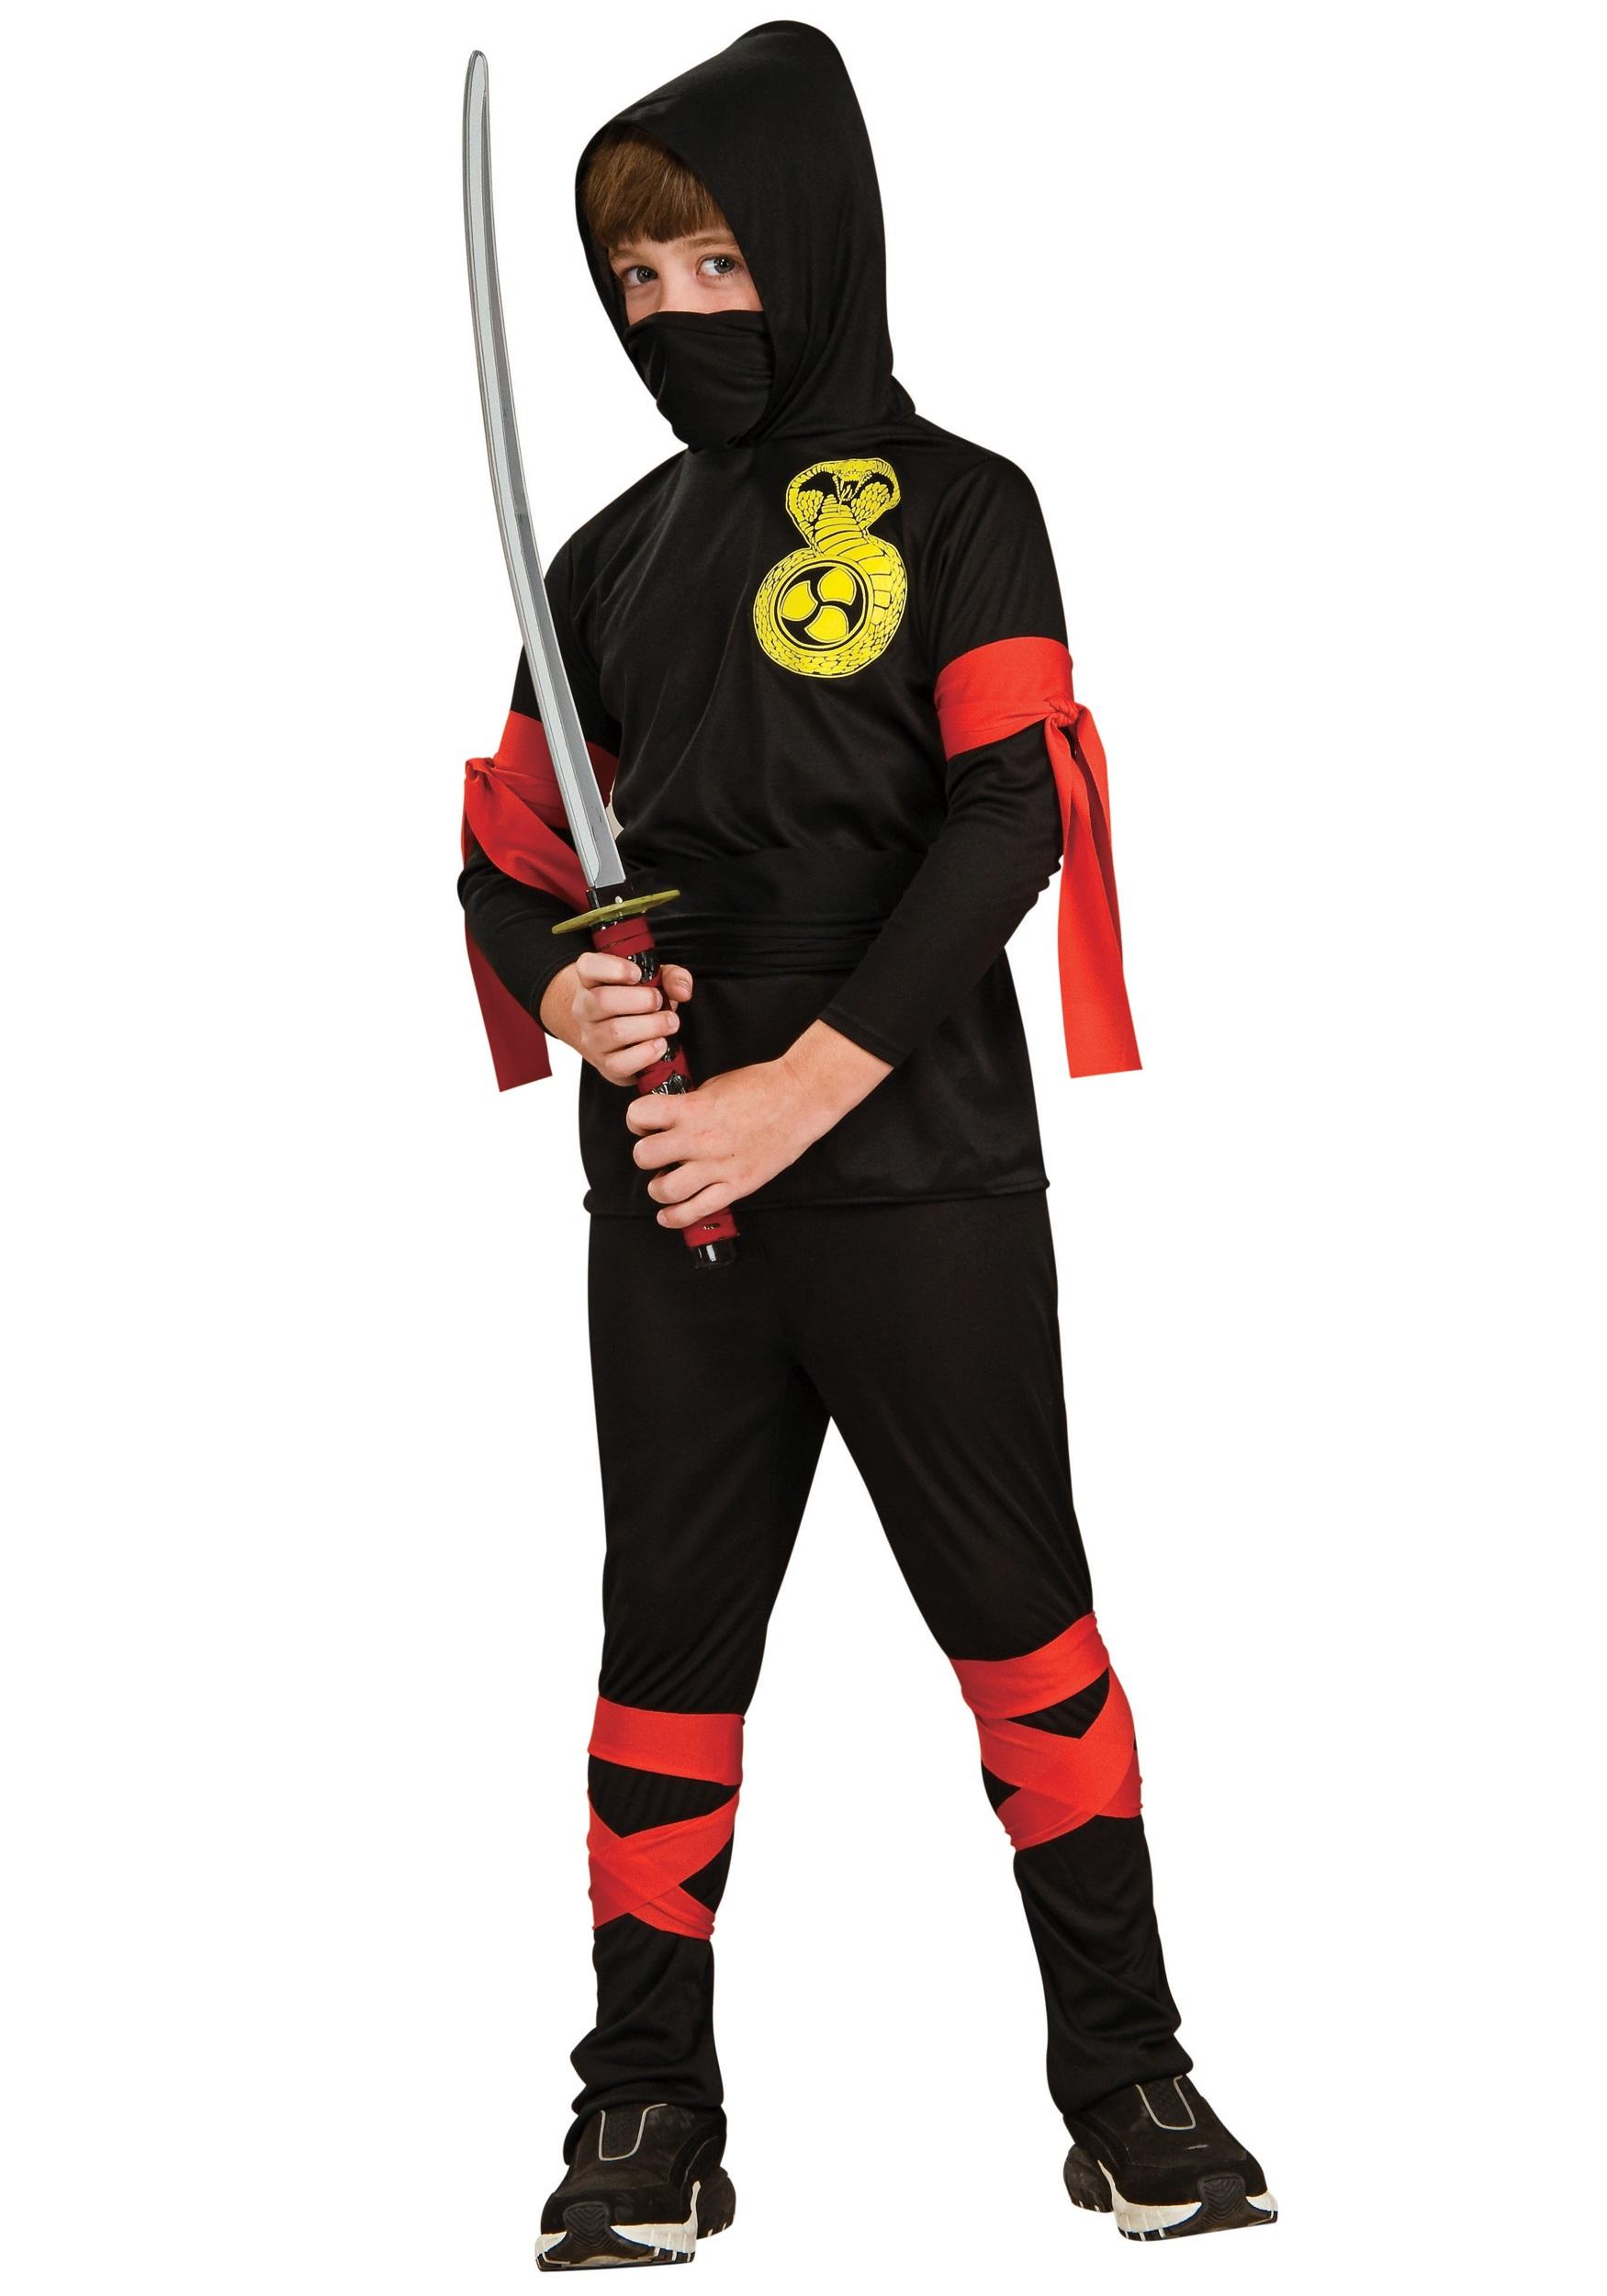 Kids Ninja Costume  sc 1 st  Halloween Costumes & Kids Ninja Costume - Halloween Costumes